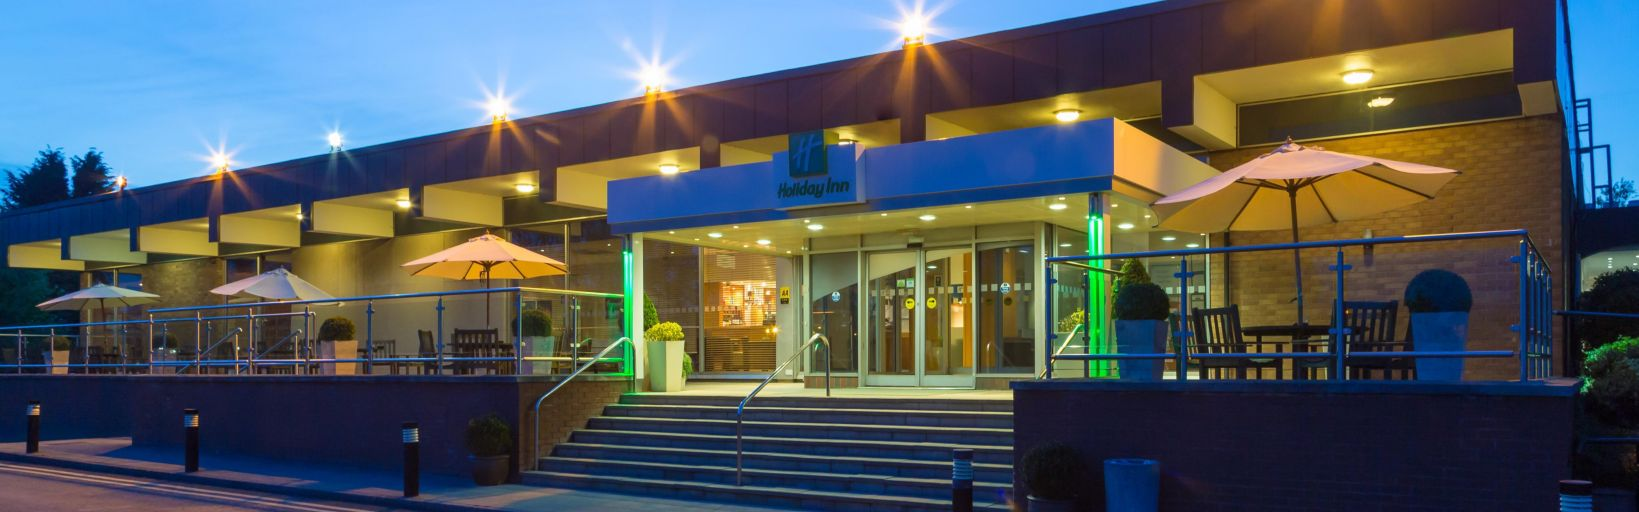 Holiday Inn Hotel Rugby-Northampton M1, Jct. 18